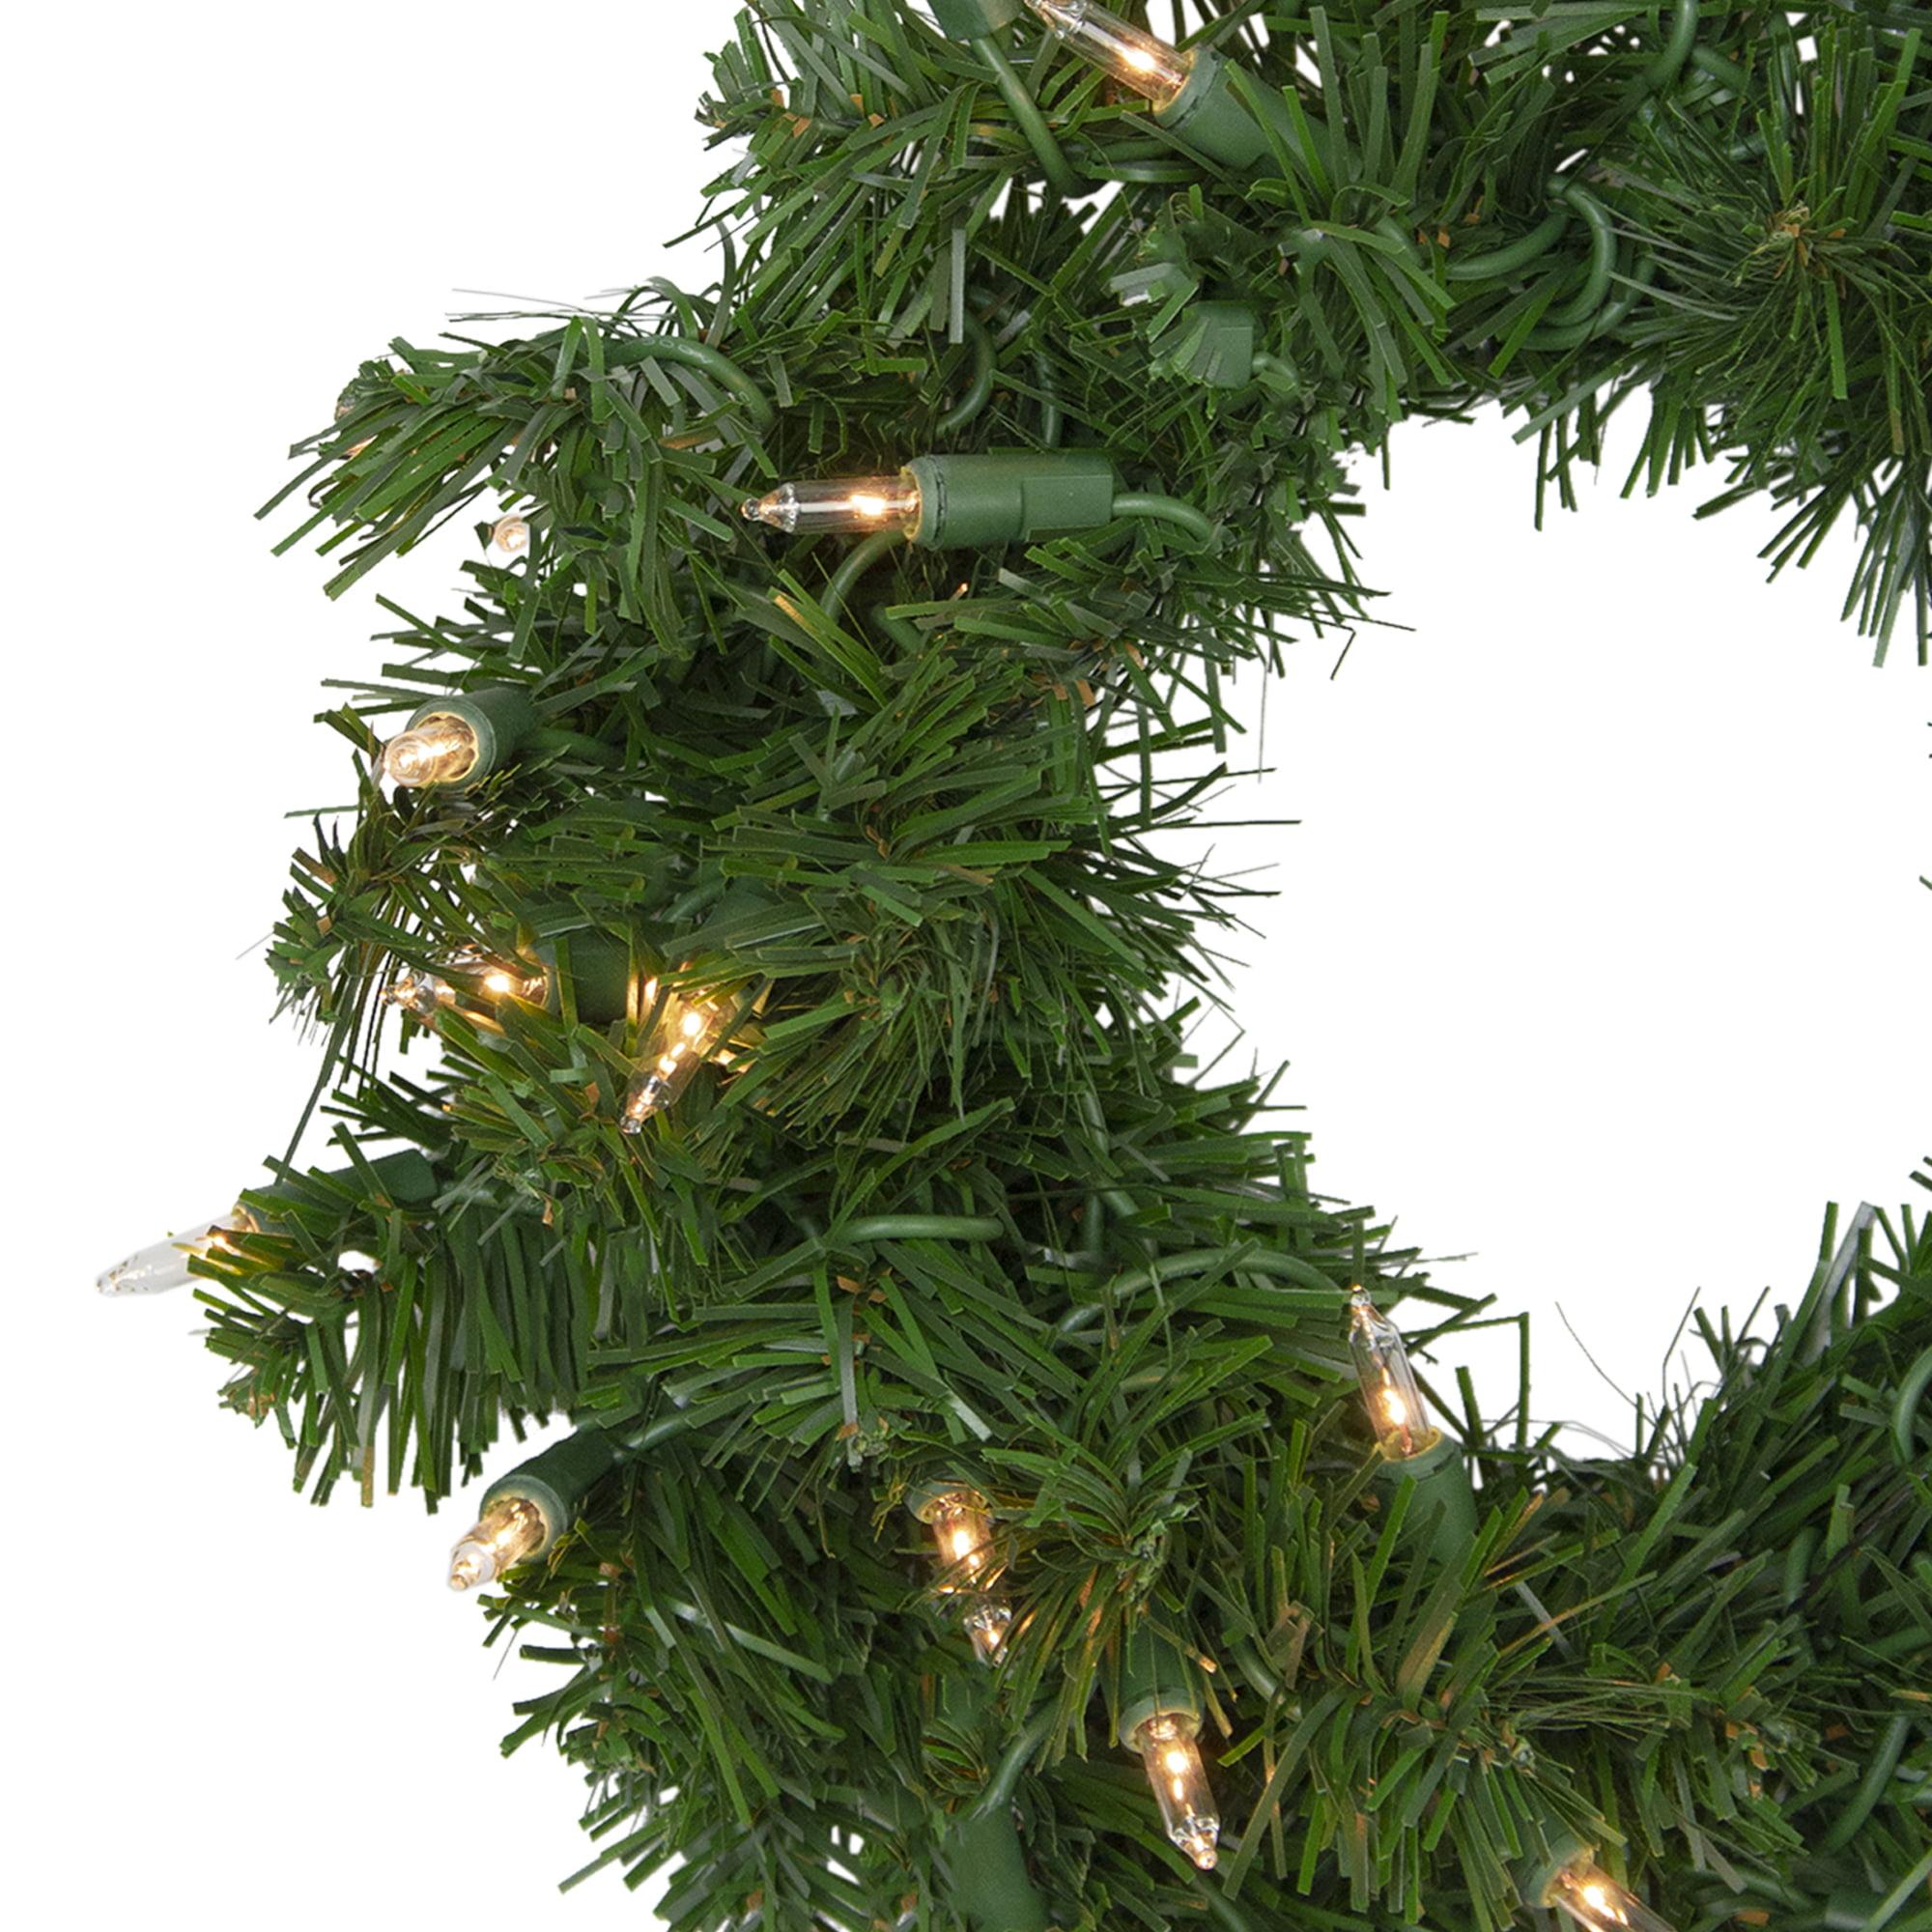 Northlight 12 Deluxe Windsor Pine Artificial Christmas Wreath Clear Lights Walmart Com Walmart Com